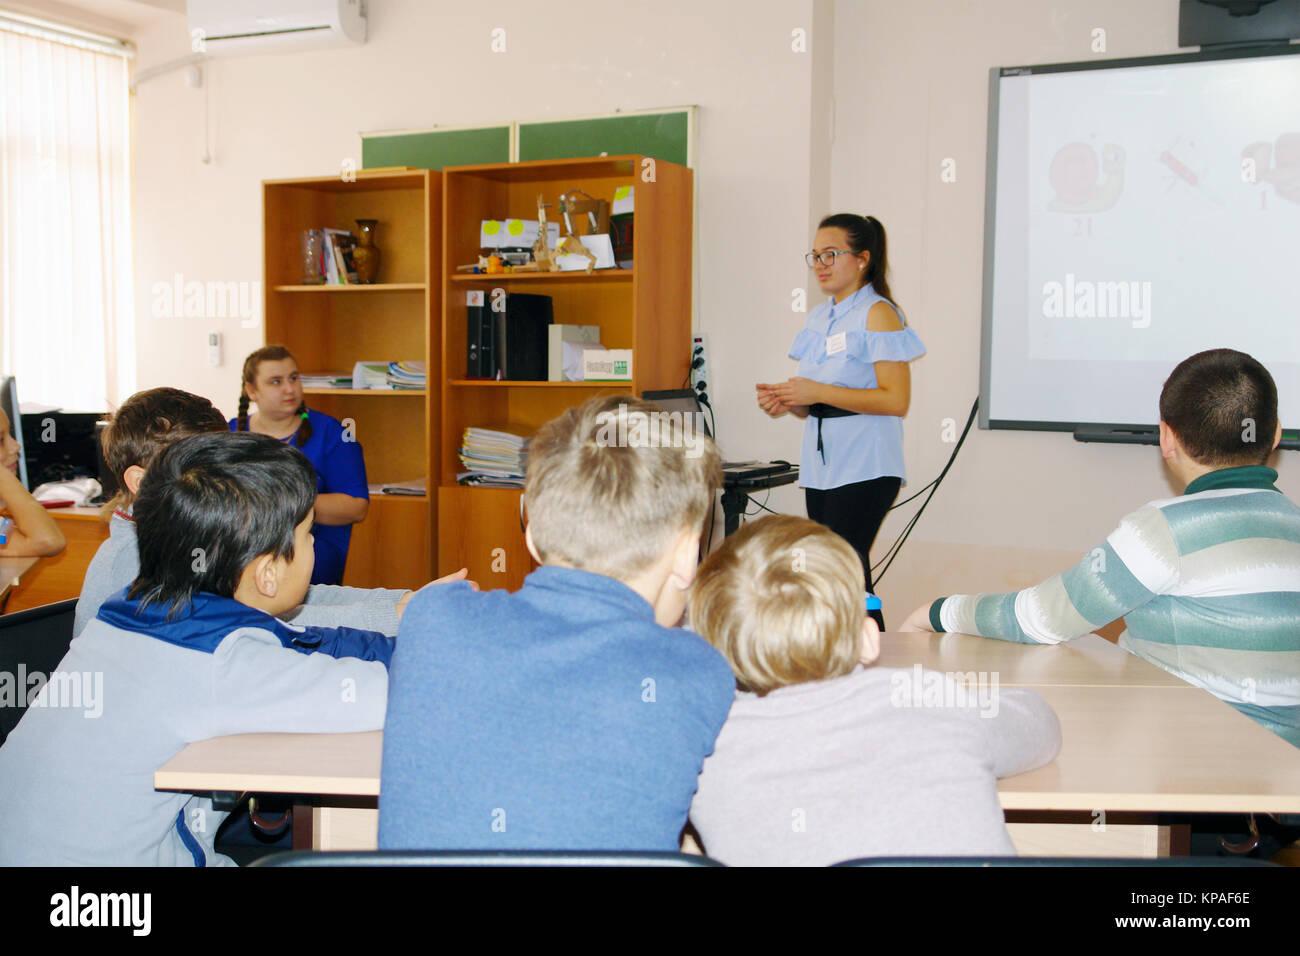 School kids in class with teacher woman - Stock Image